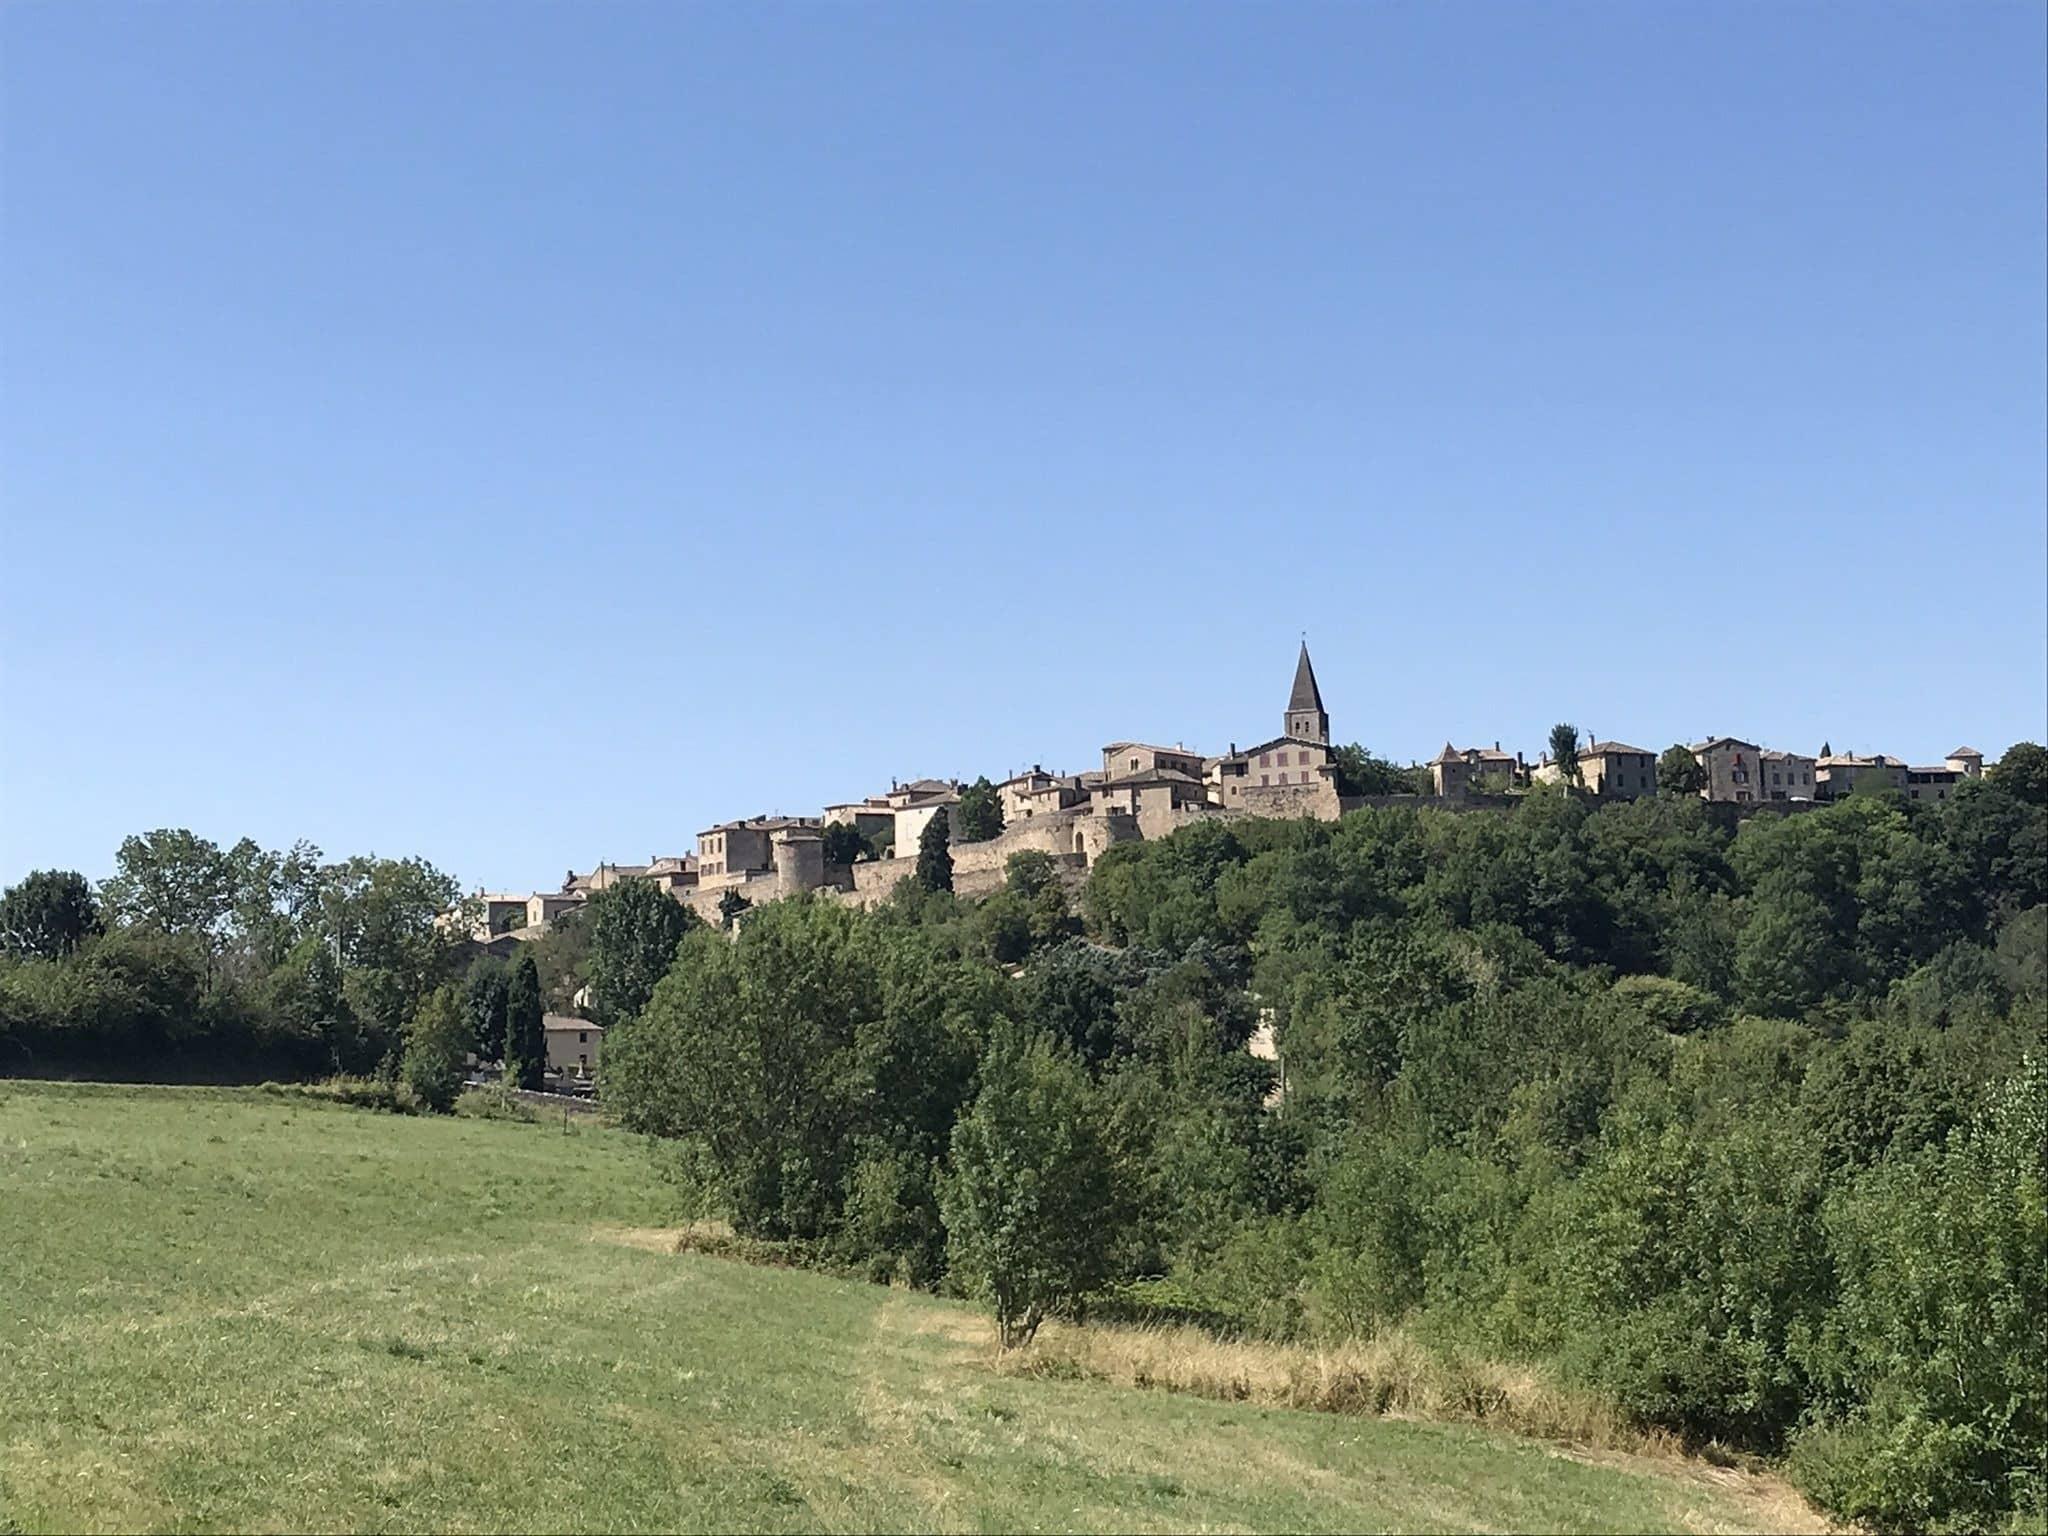 Randonnées Tarn : Le sentier du patrimoine via chemin de Mespel